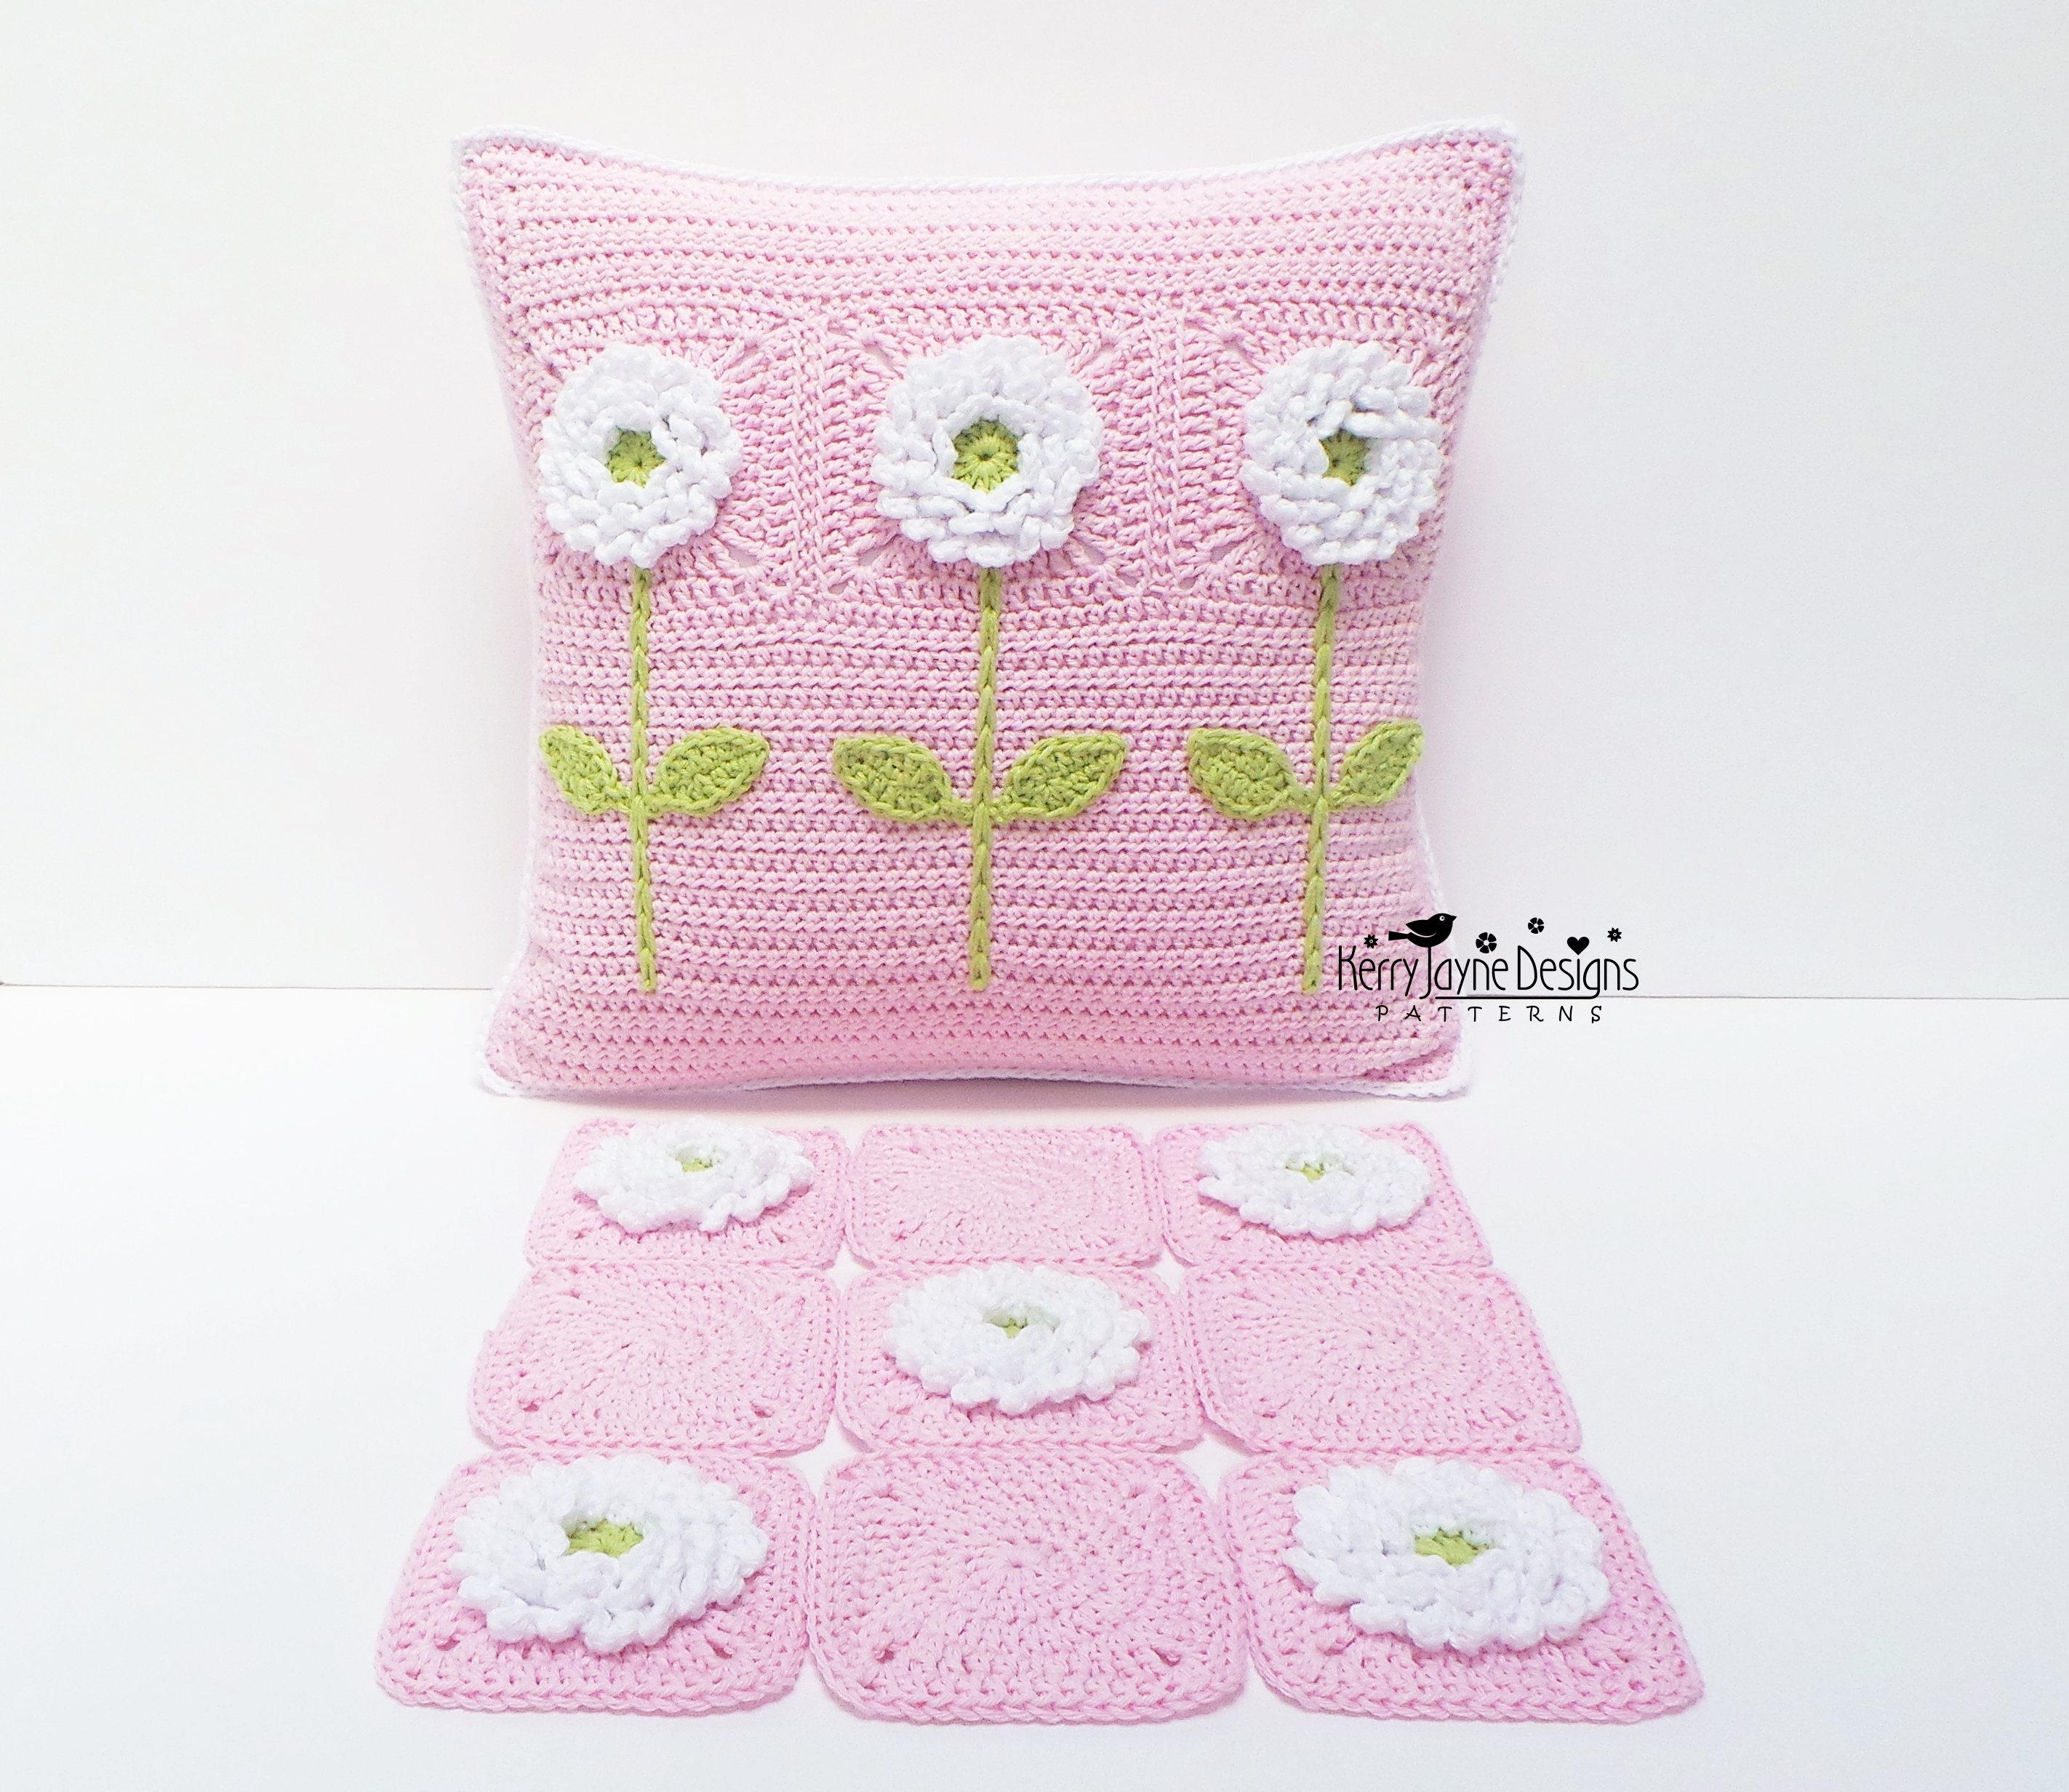 CROCHET PILLOW PATTERN Delightful Dahlias Crochet Cushion   Etsy